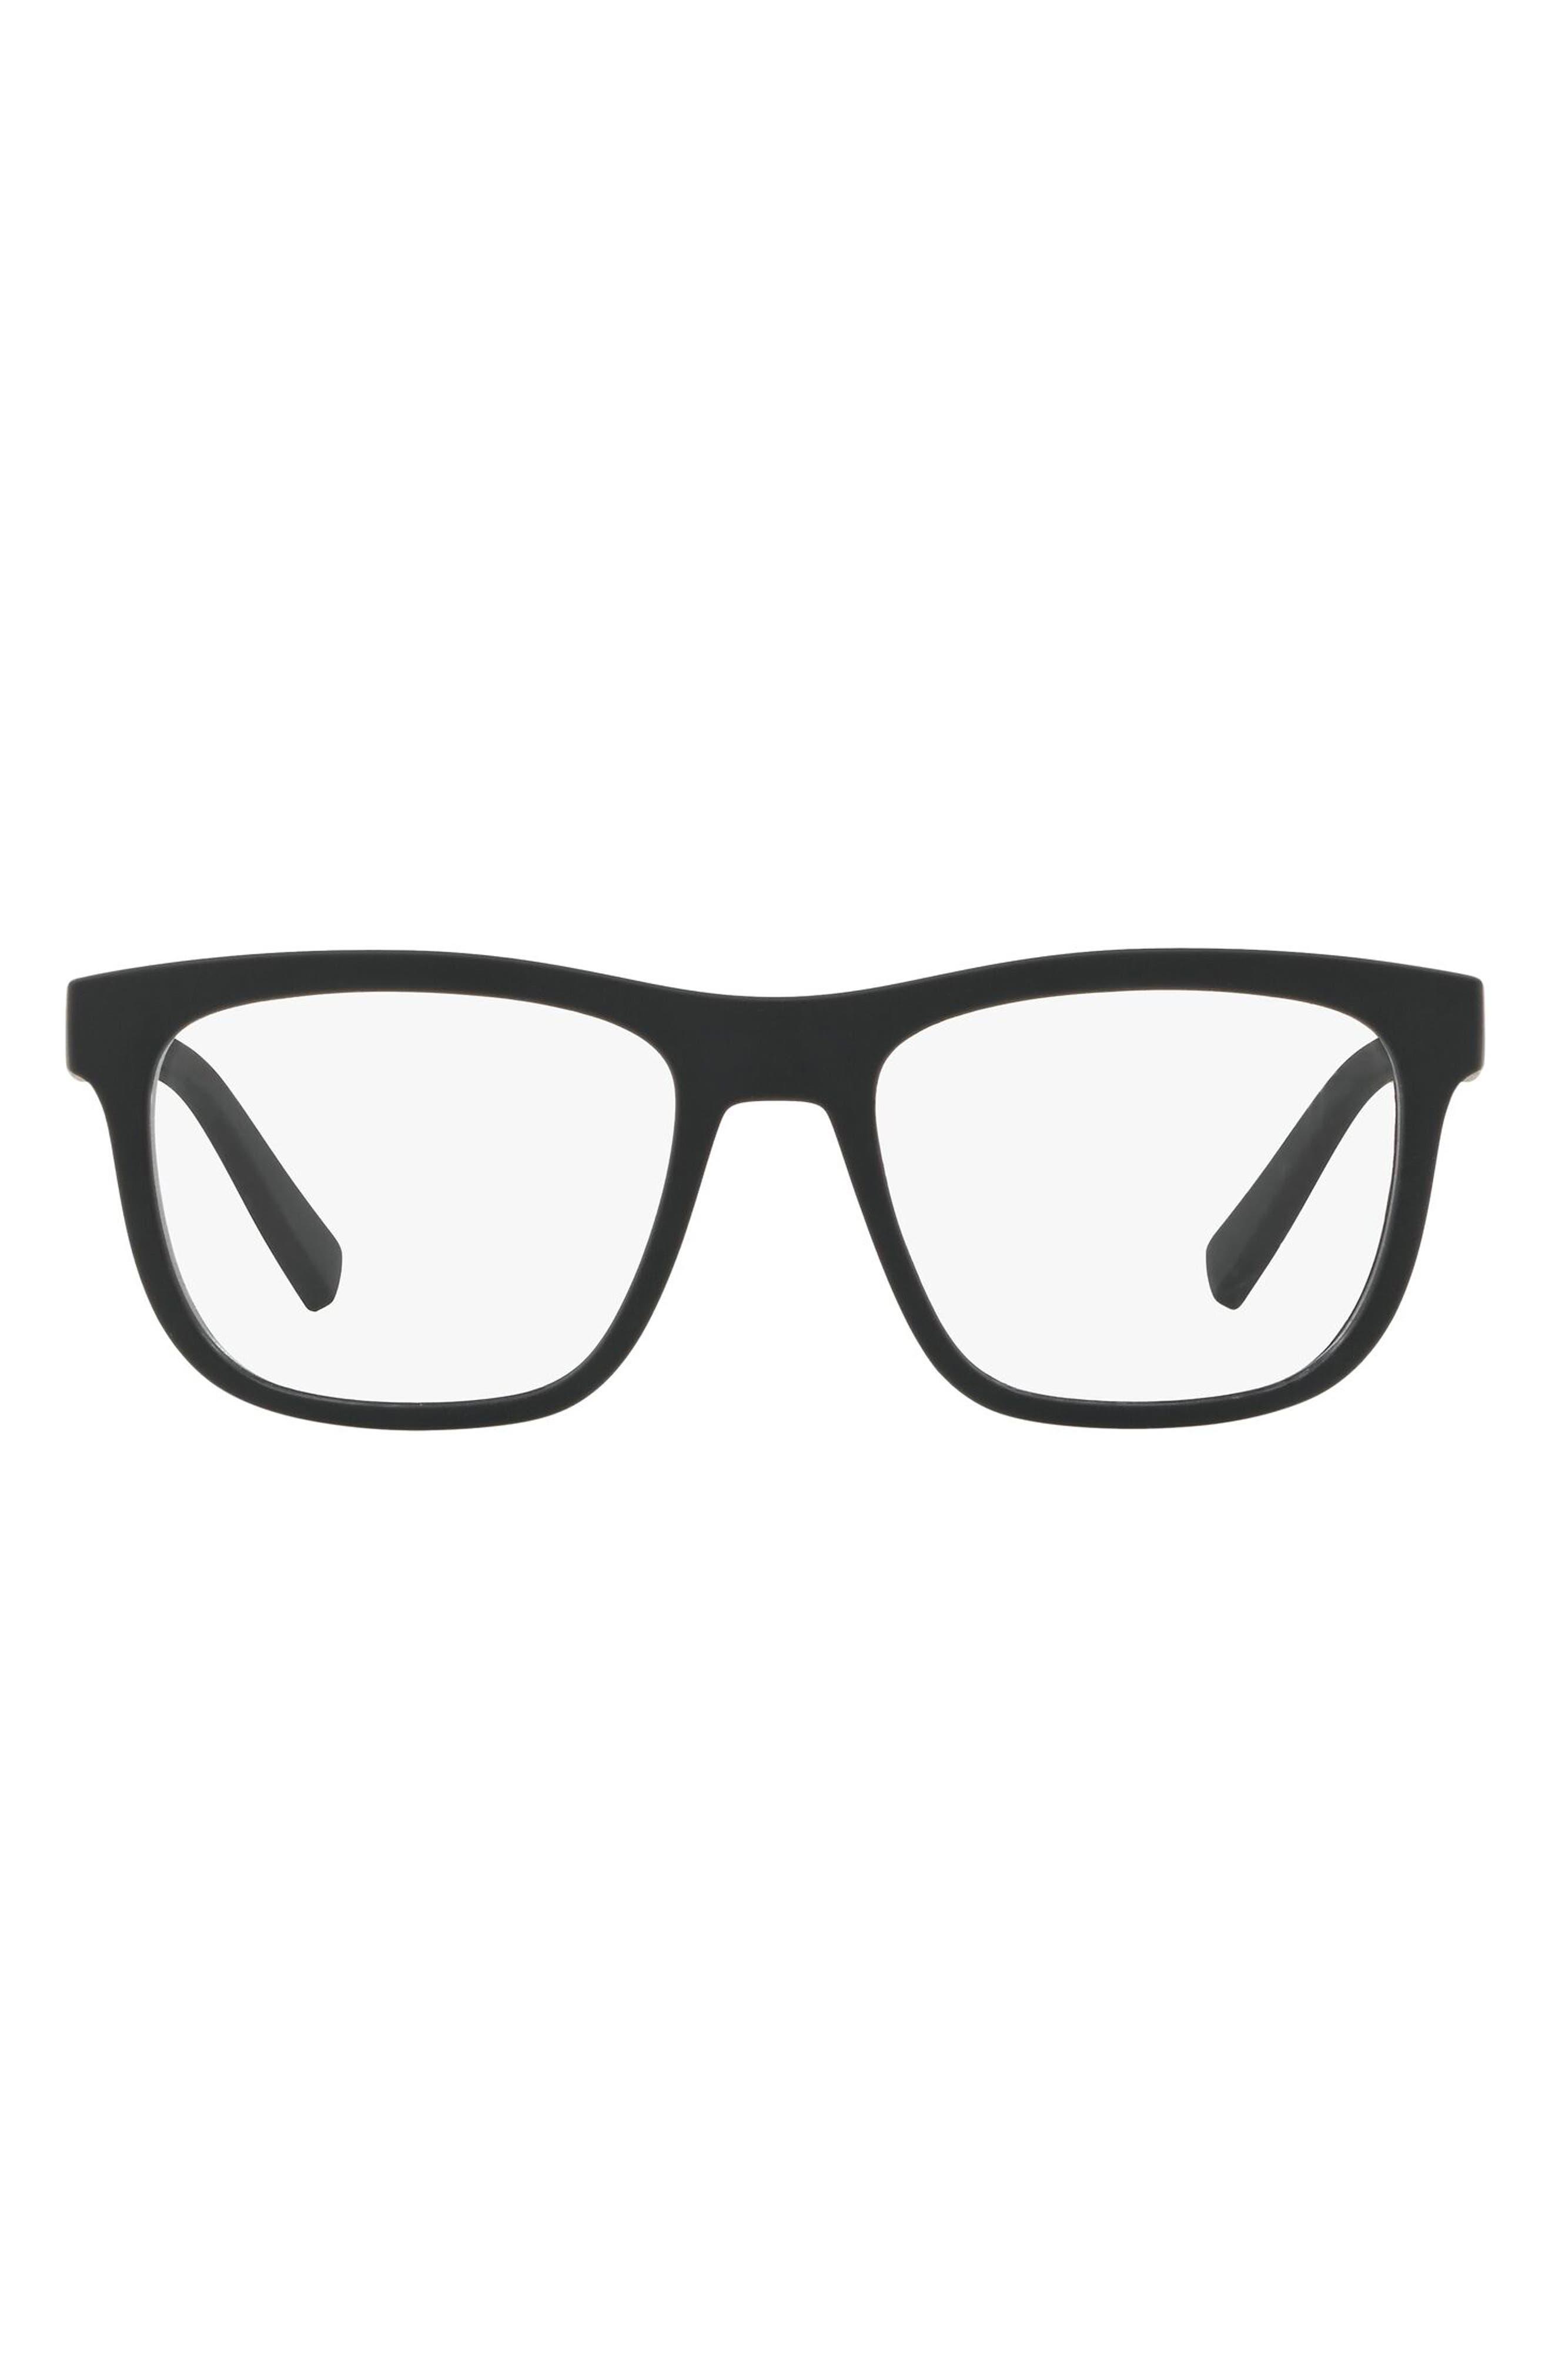 53mm Rectangular Optical Glasses